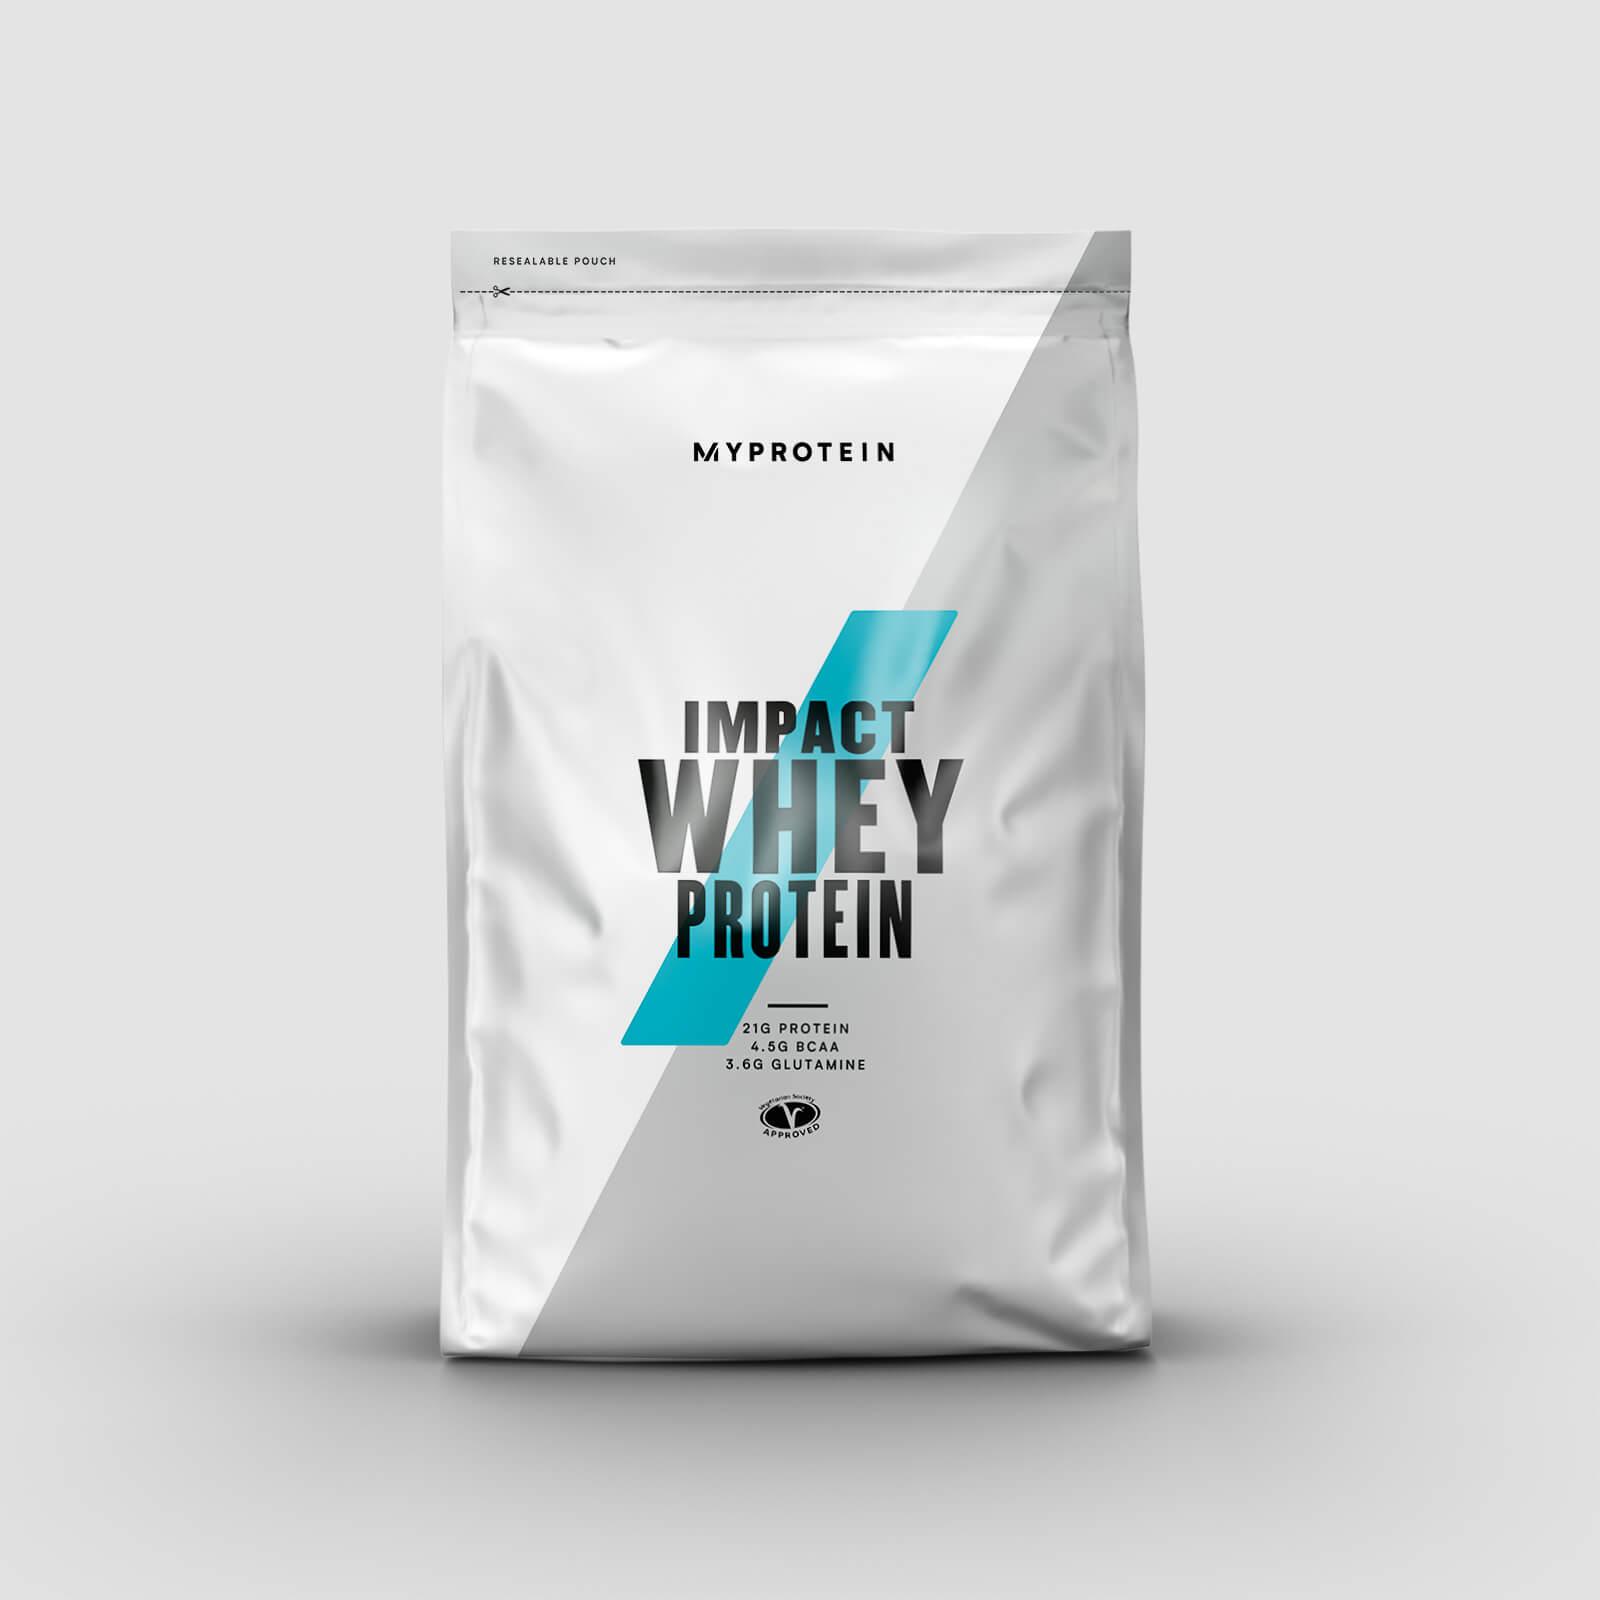 Myprotein Impact Whey Protein - 1kg - Chocolat-Noix de Coco